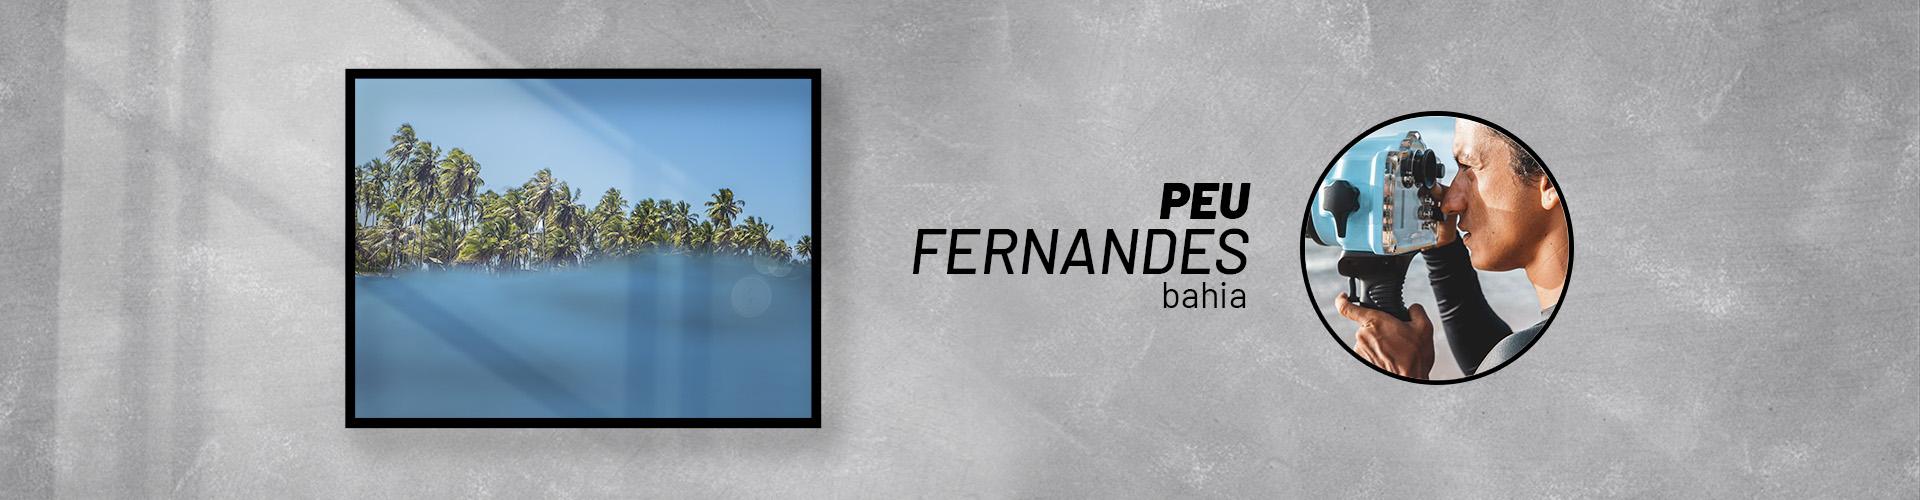 Página Artista | Peu Fernandes